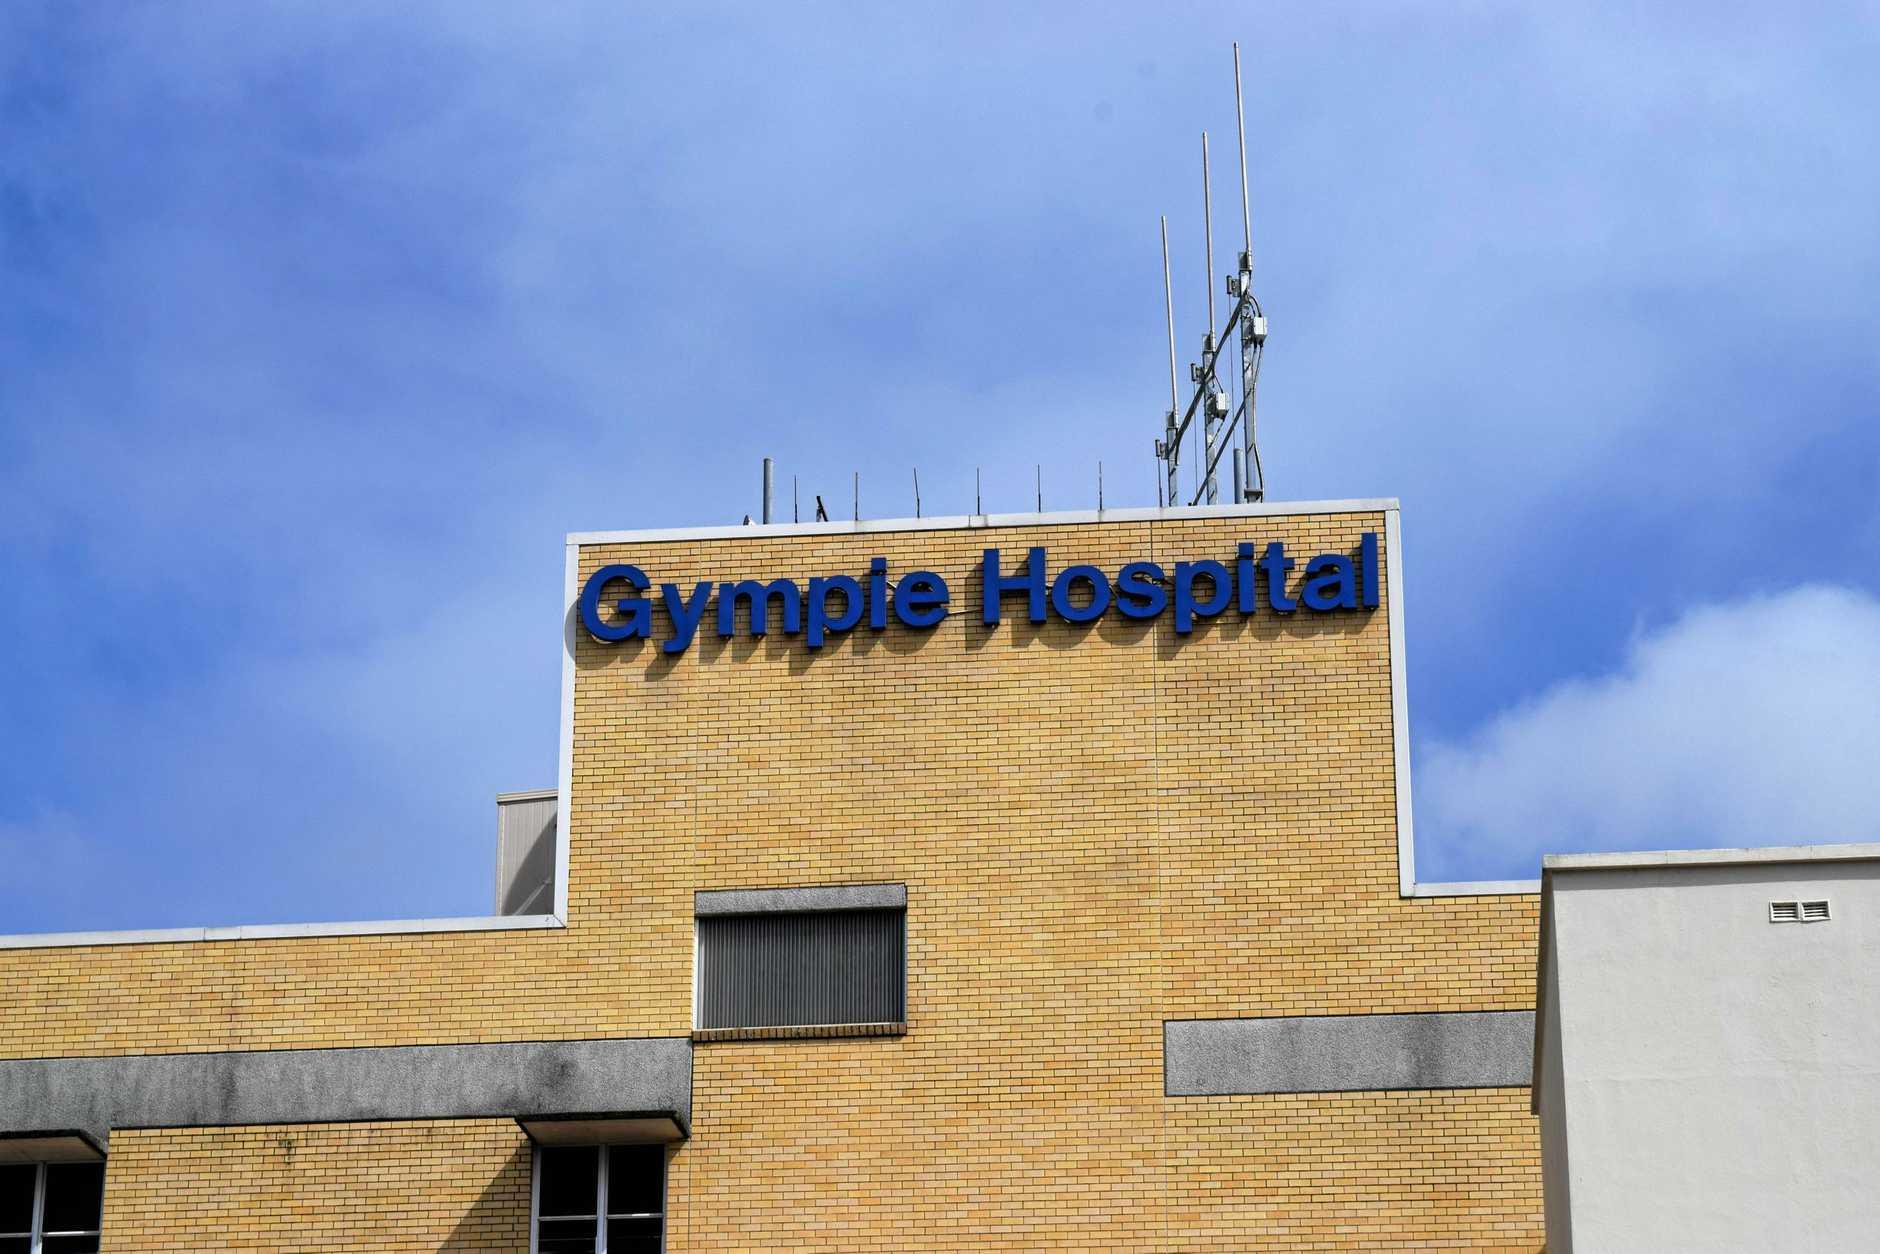 Gympie Hospital 150 years.